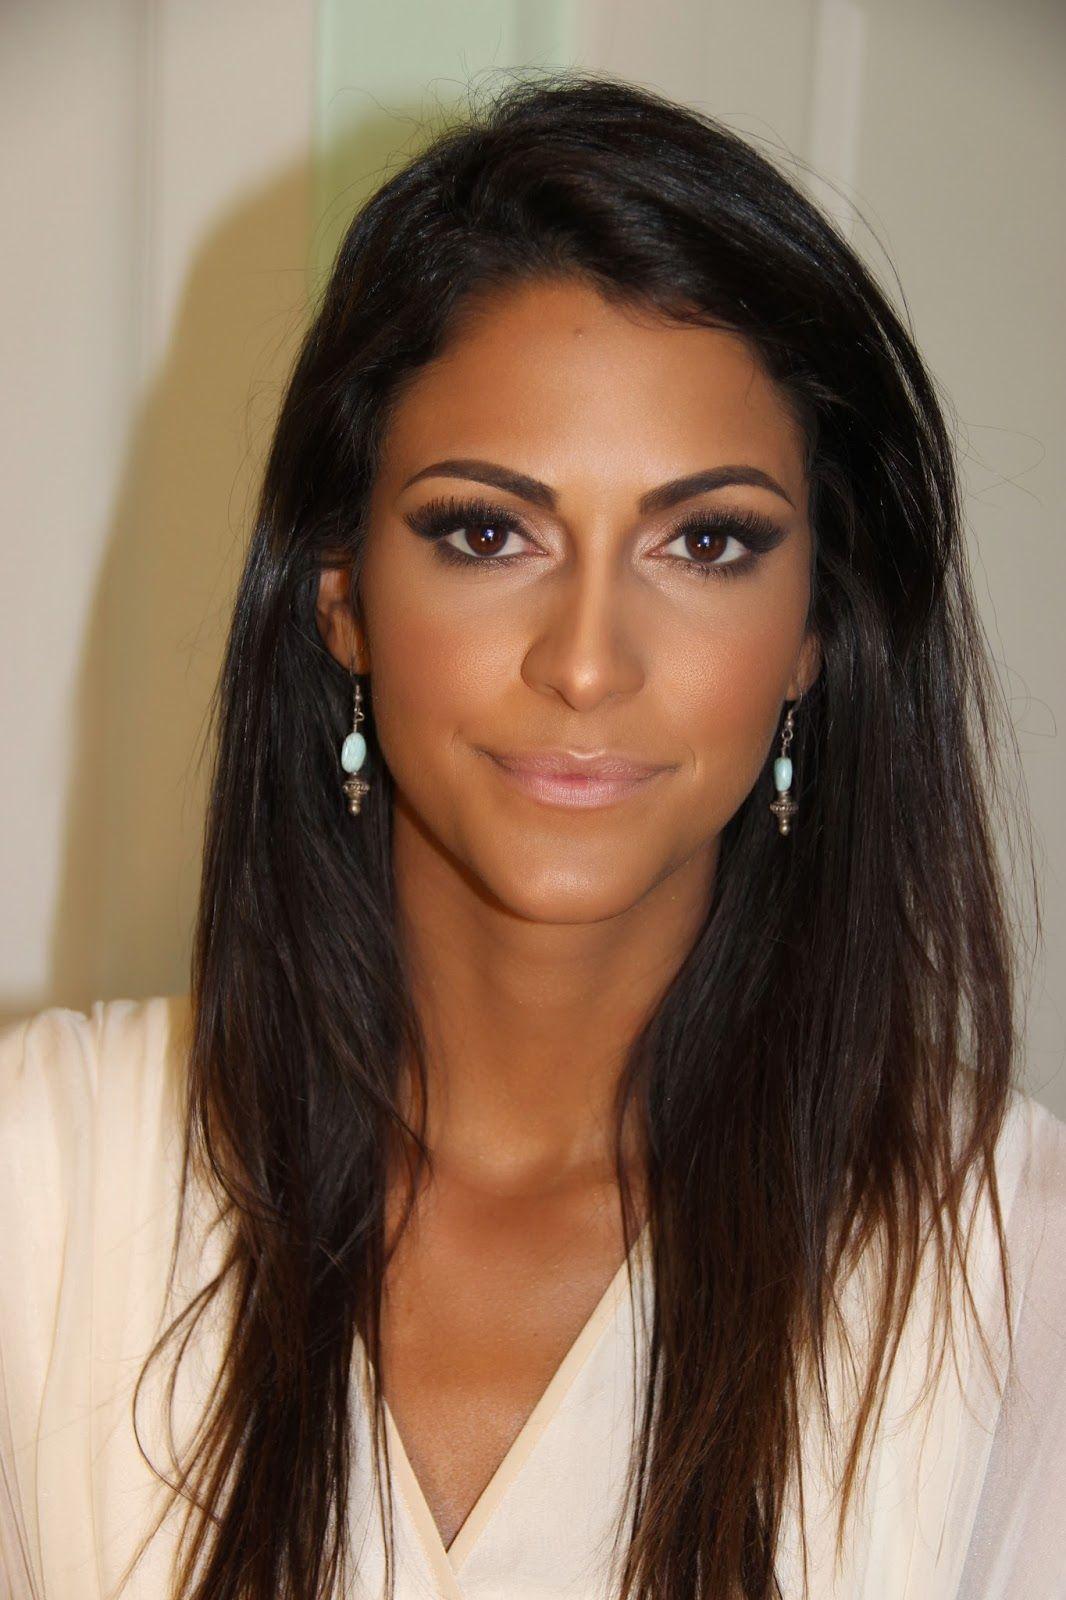 makeup medium to tan skin tones Tanned makeup, Hair